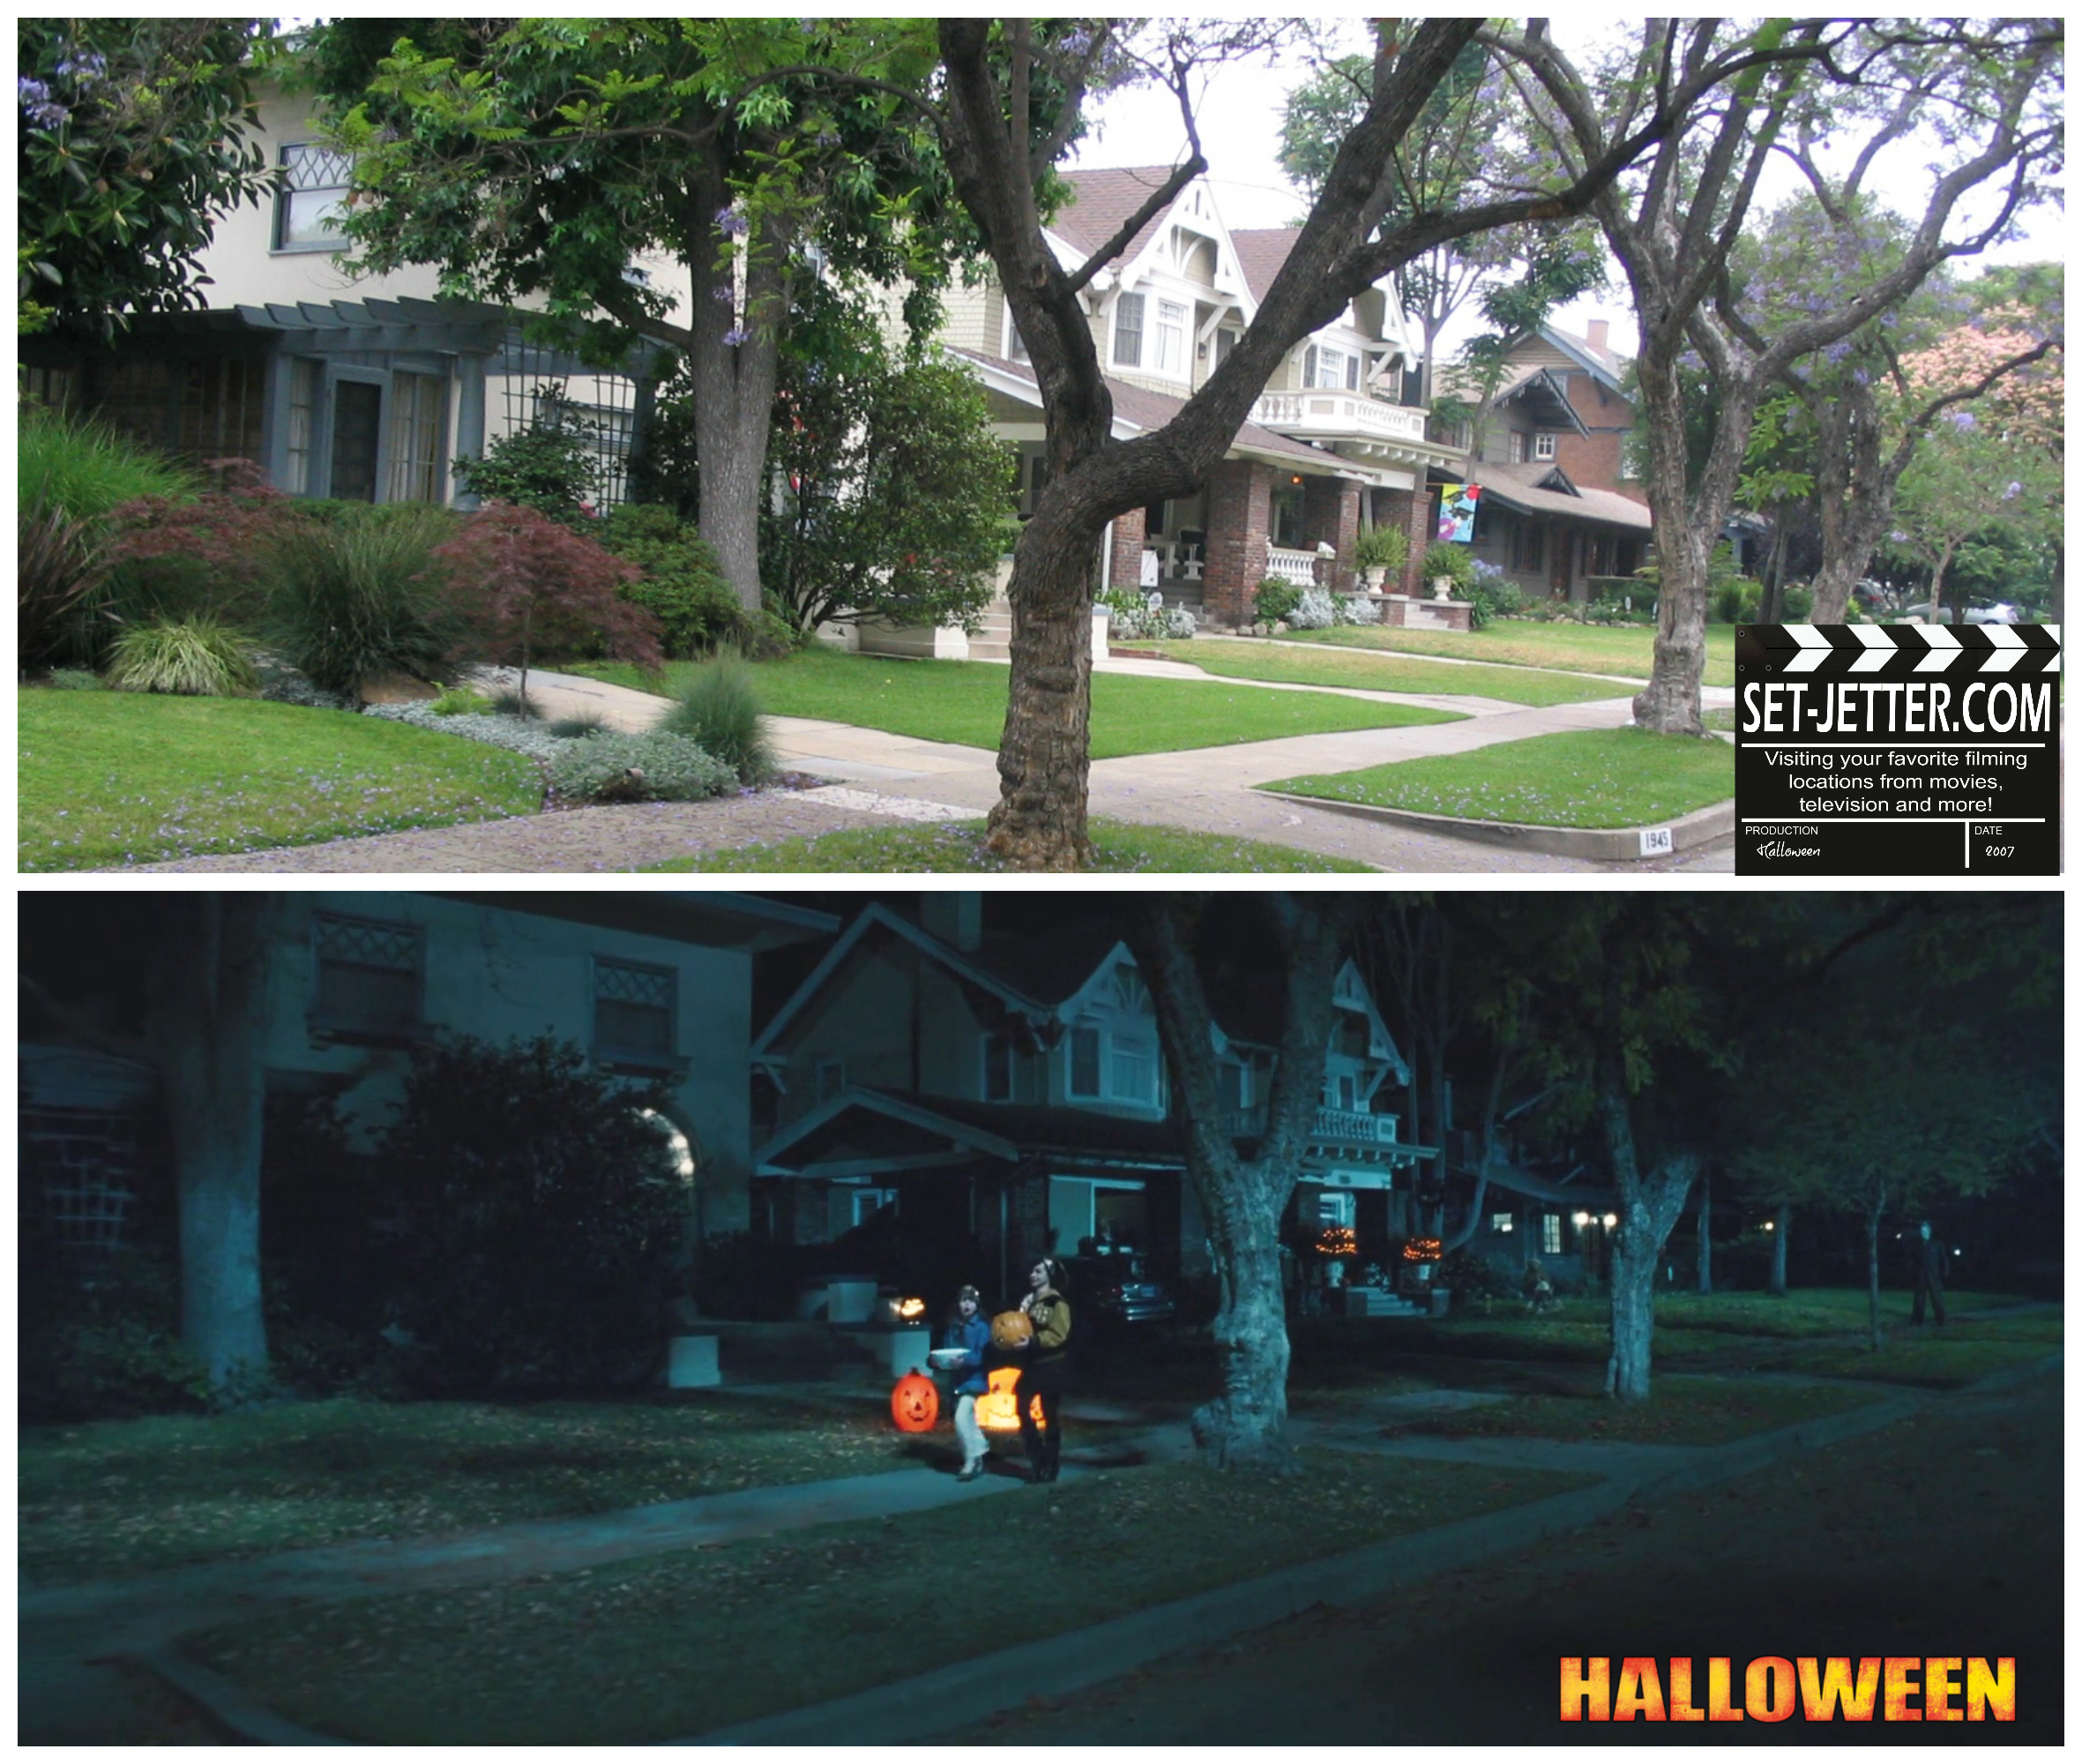 Halloween 2007 comparison 62.jpg